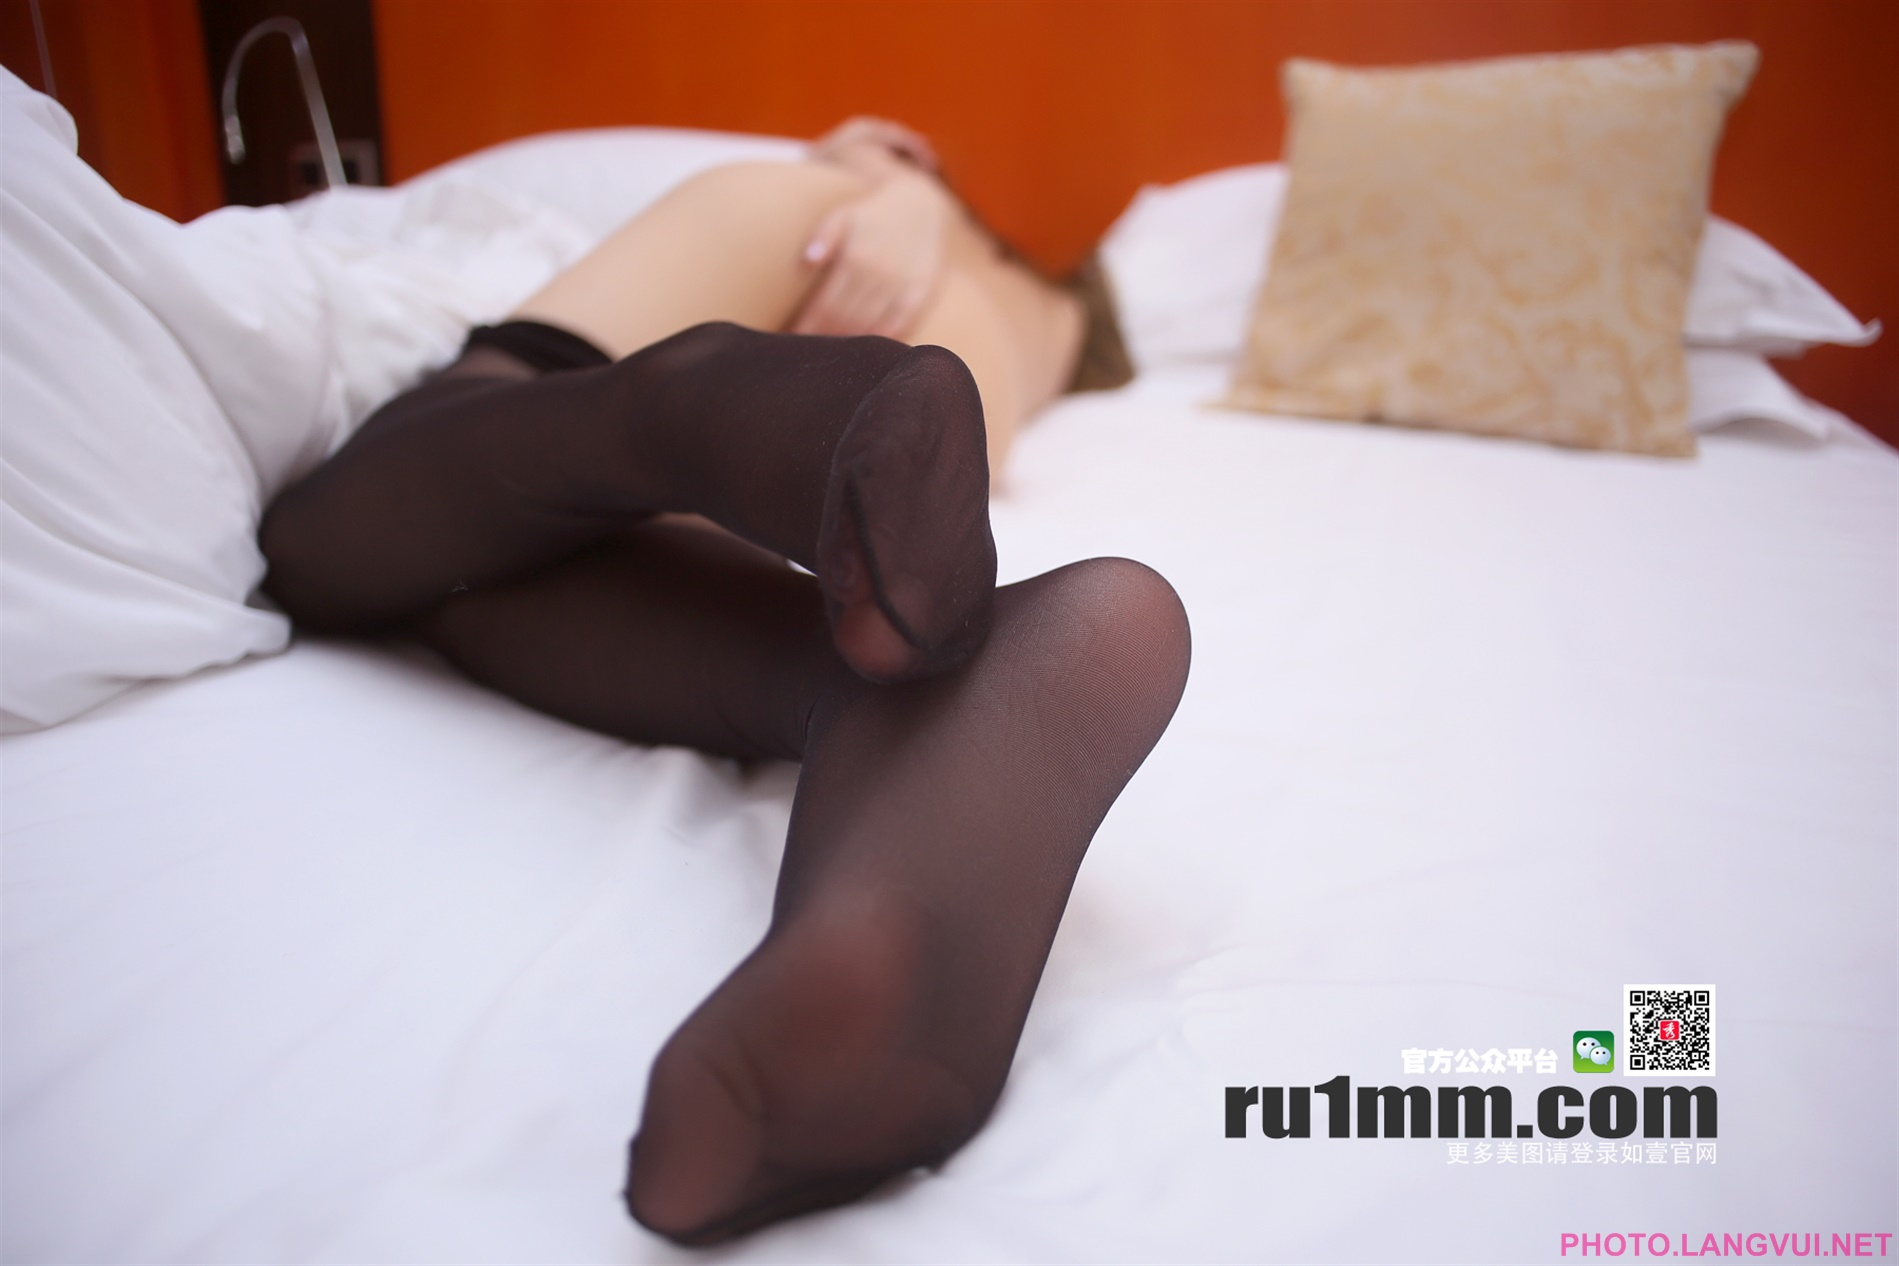 RU1MM No 257